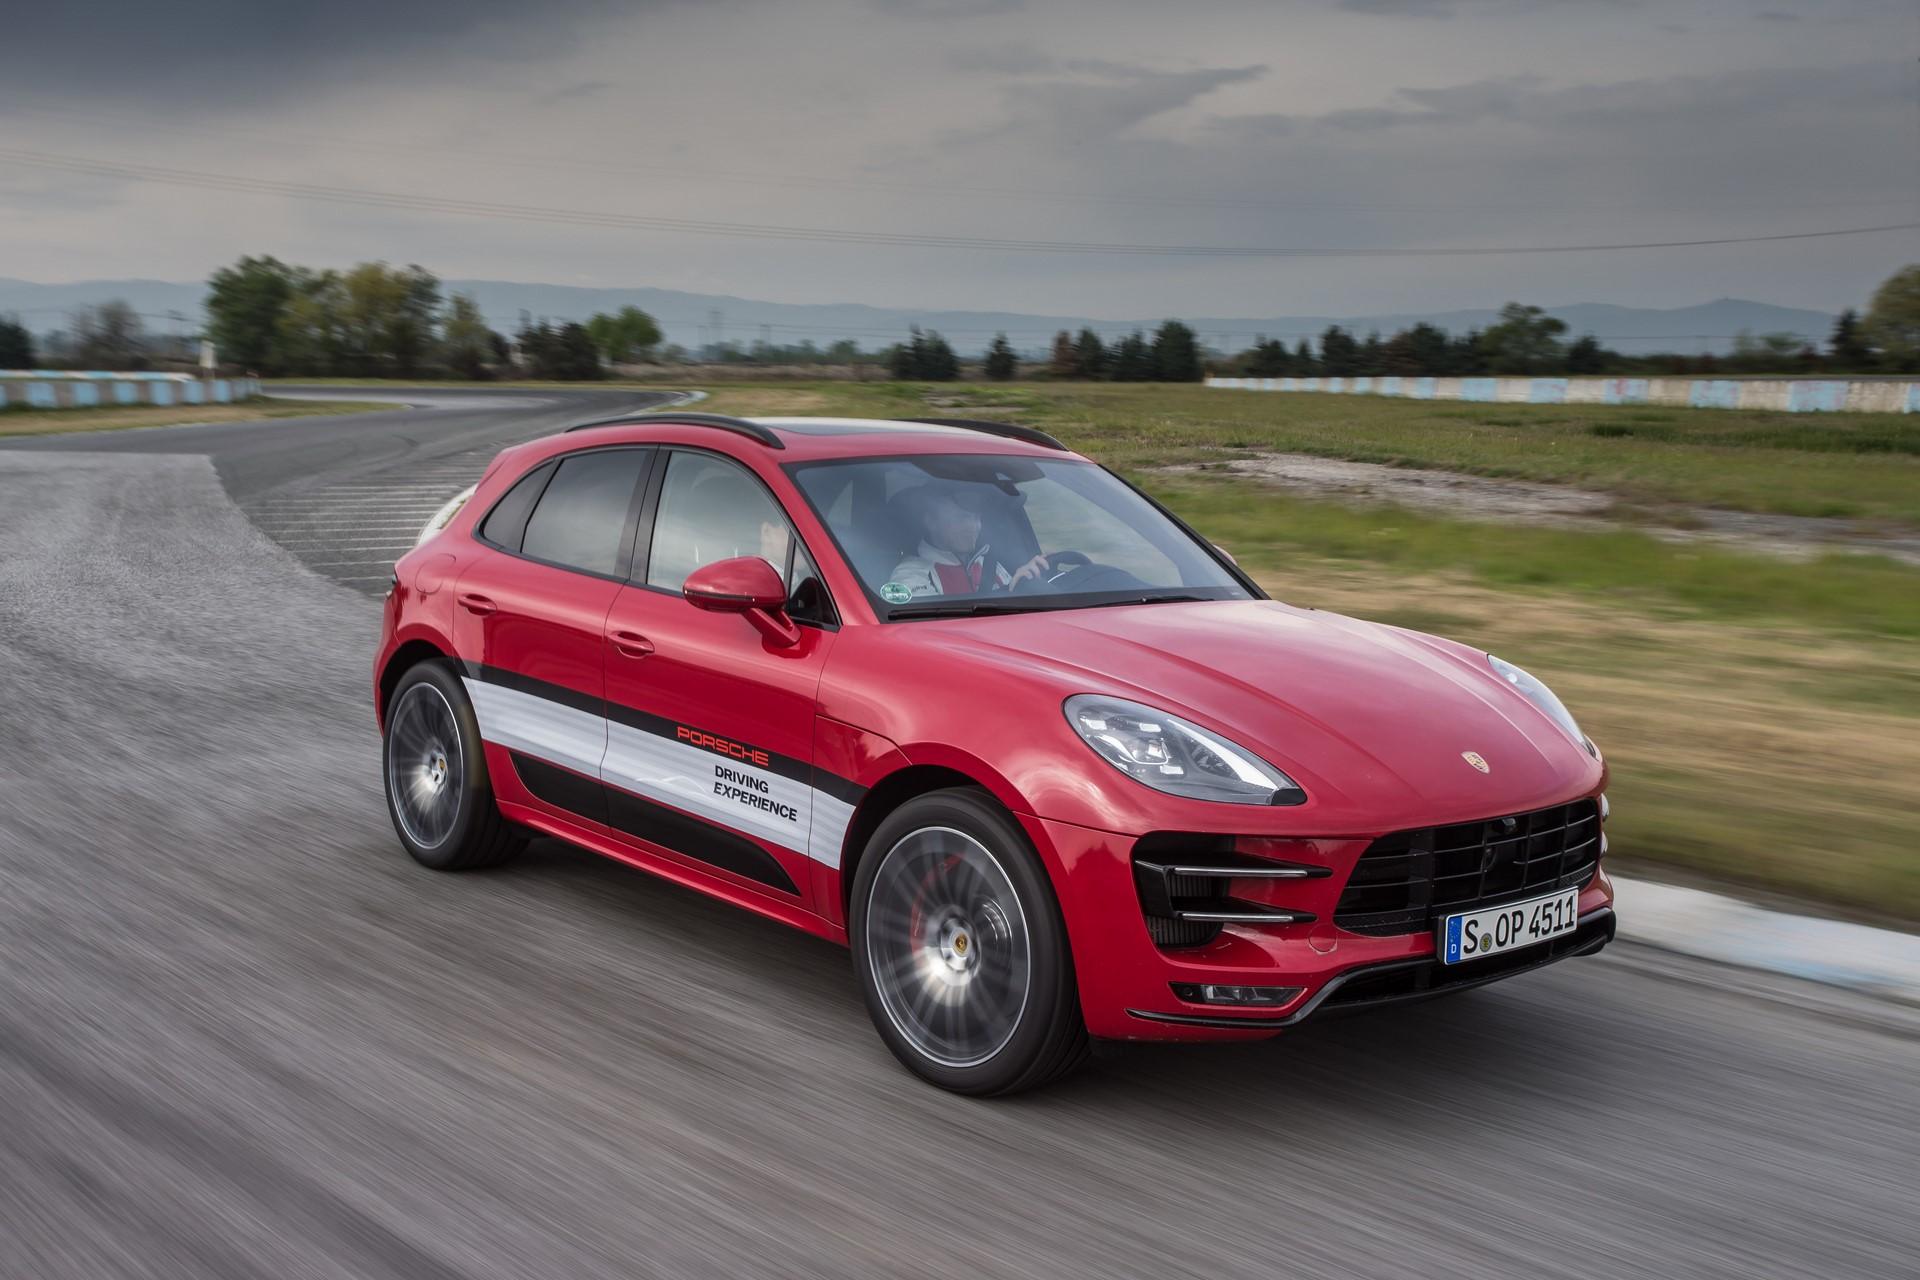 Porsche Driving Experience 2017 Serres (56)